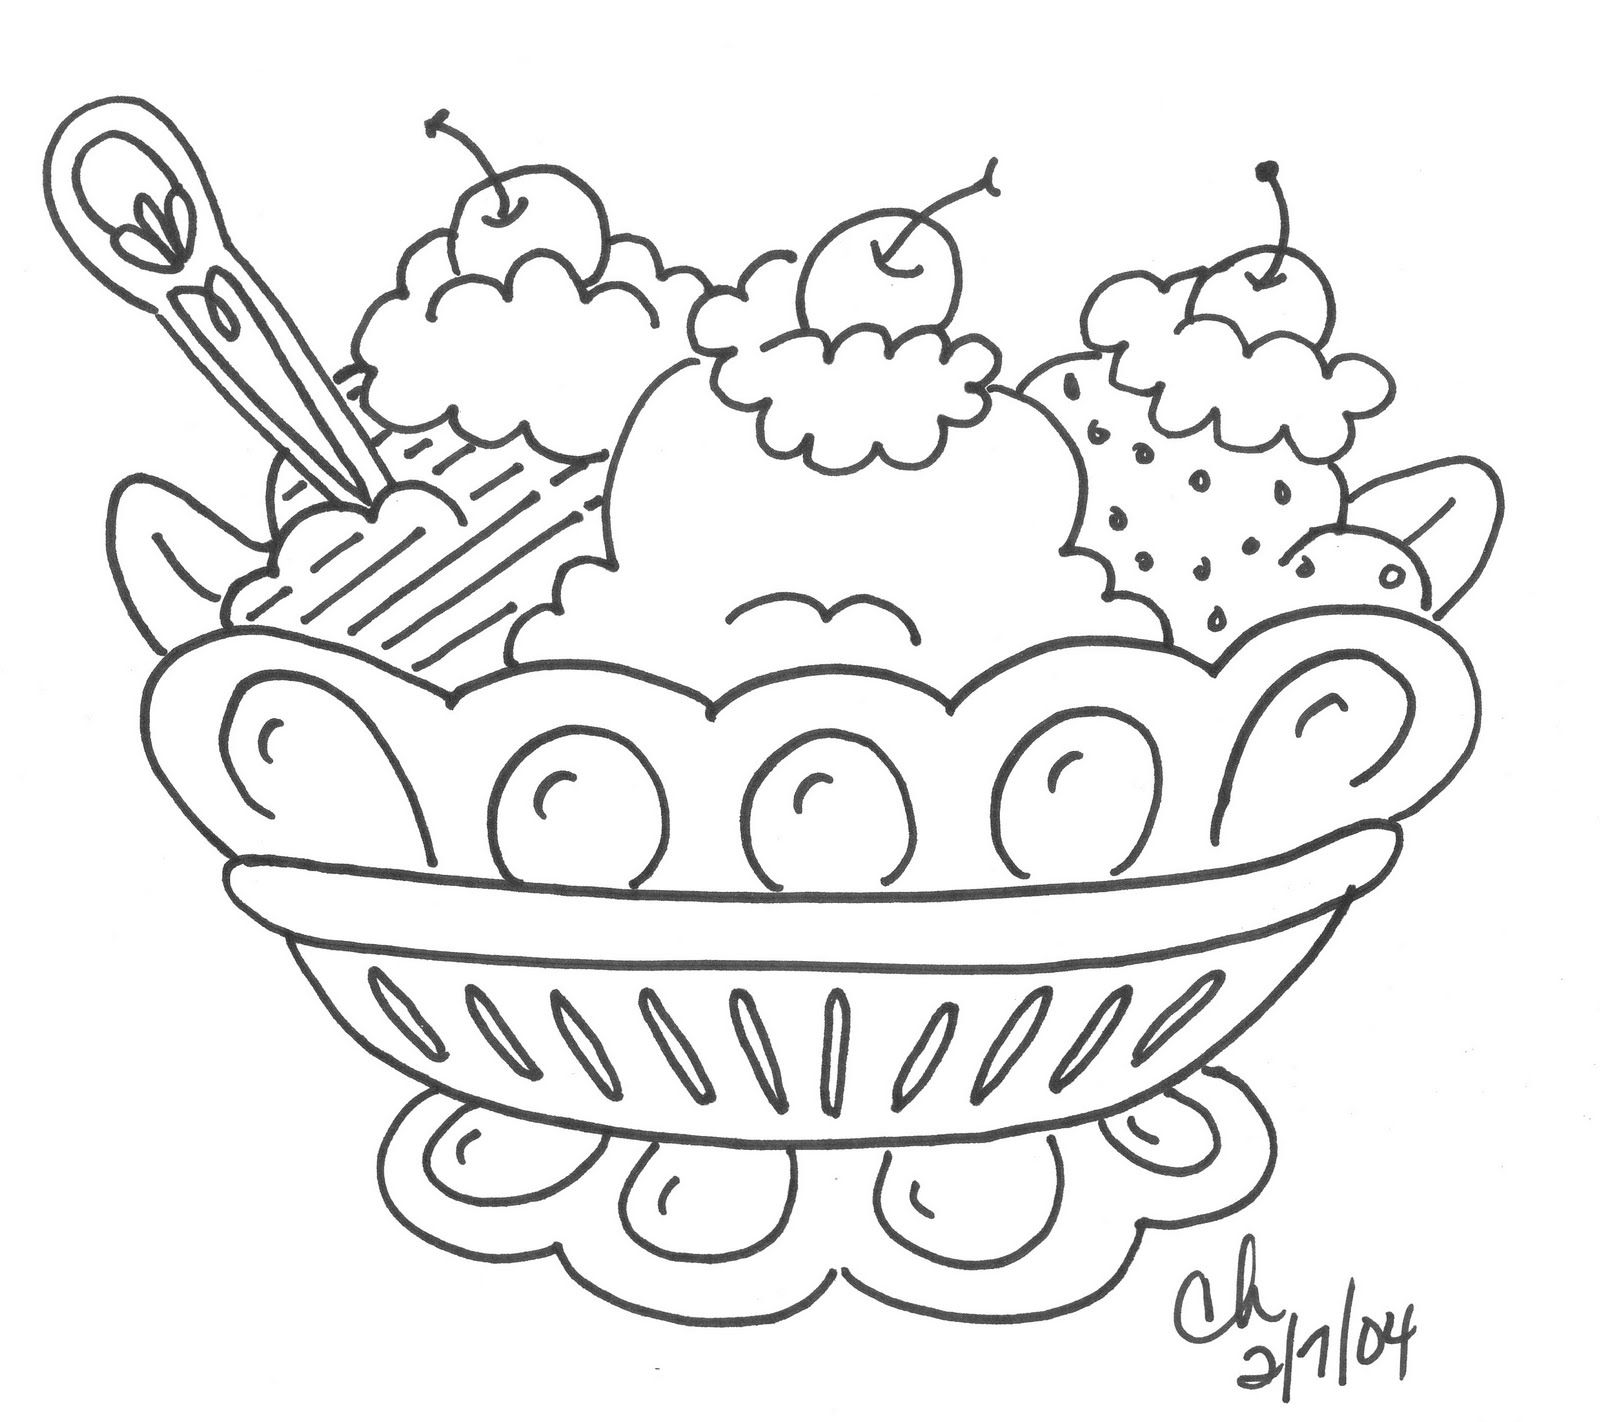 Stitch, Stitch, Stitch: Free redwork dessert | Embroidery ...